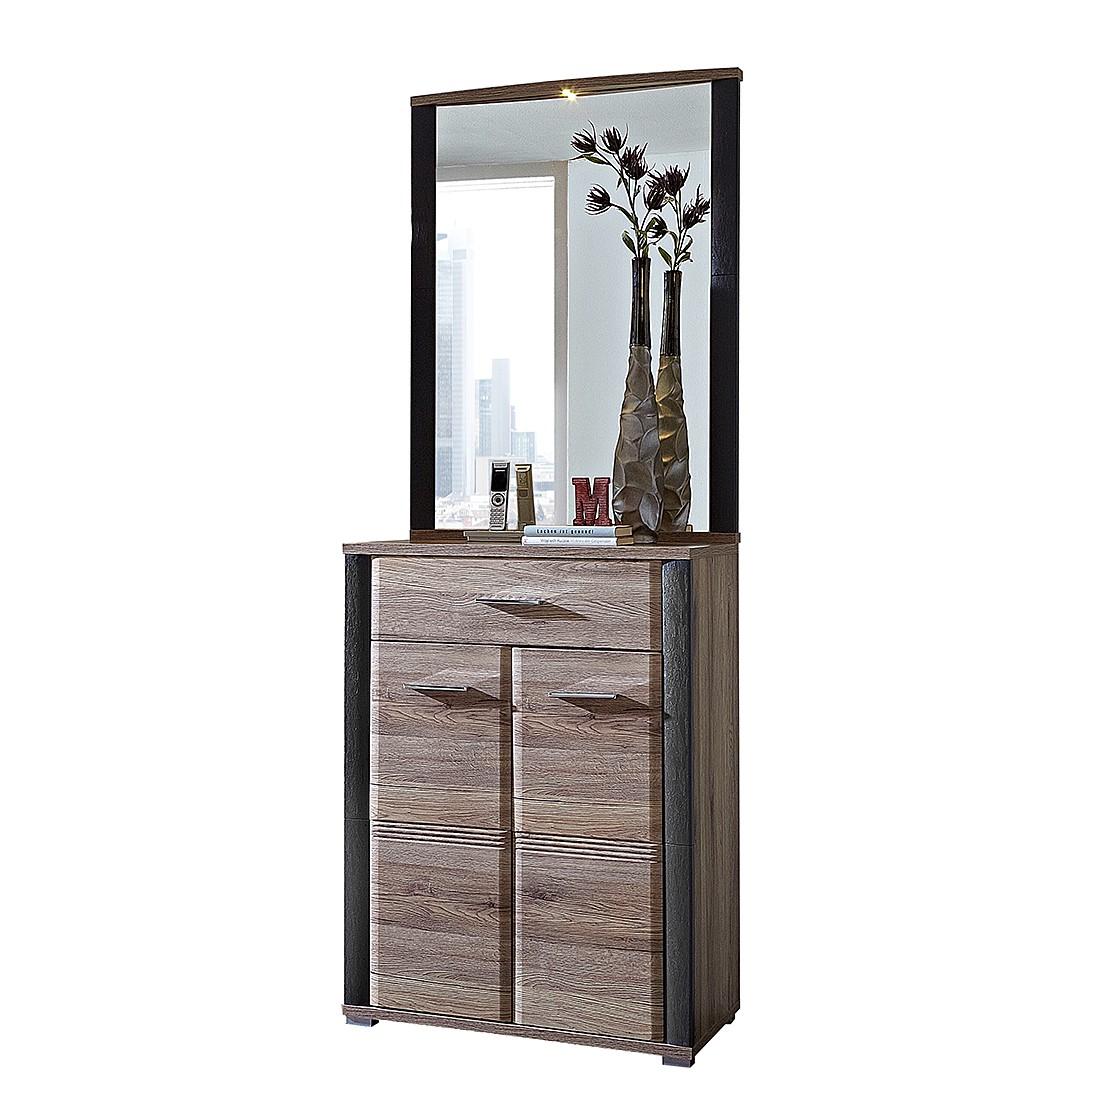 garderobenset skanderborg 2 teilig eiche dekor. Black Bedroom Furniture Sets. Home Design Ideas